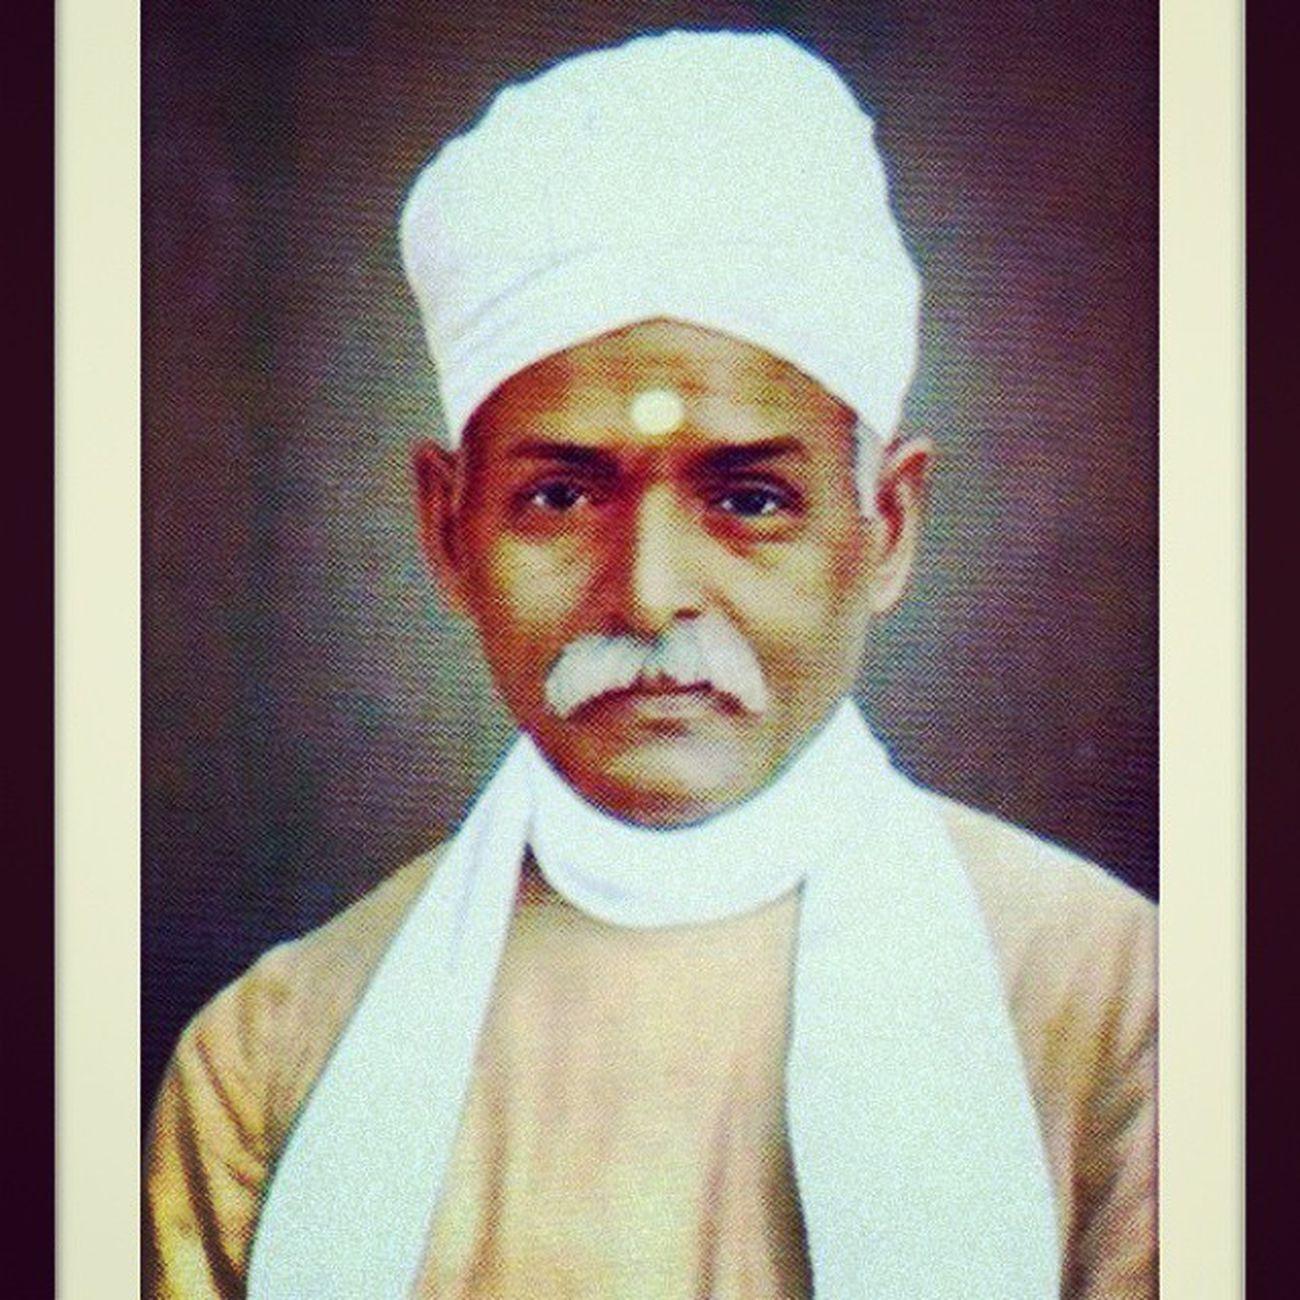 Remembering & grand tributes on 153th birth anniversary of the greatest... PanditMadanMohanMalviya .